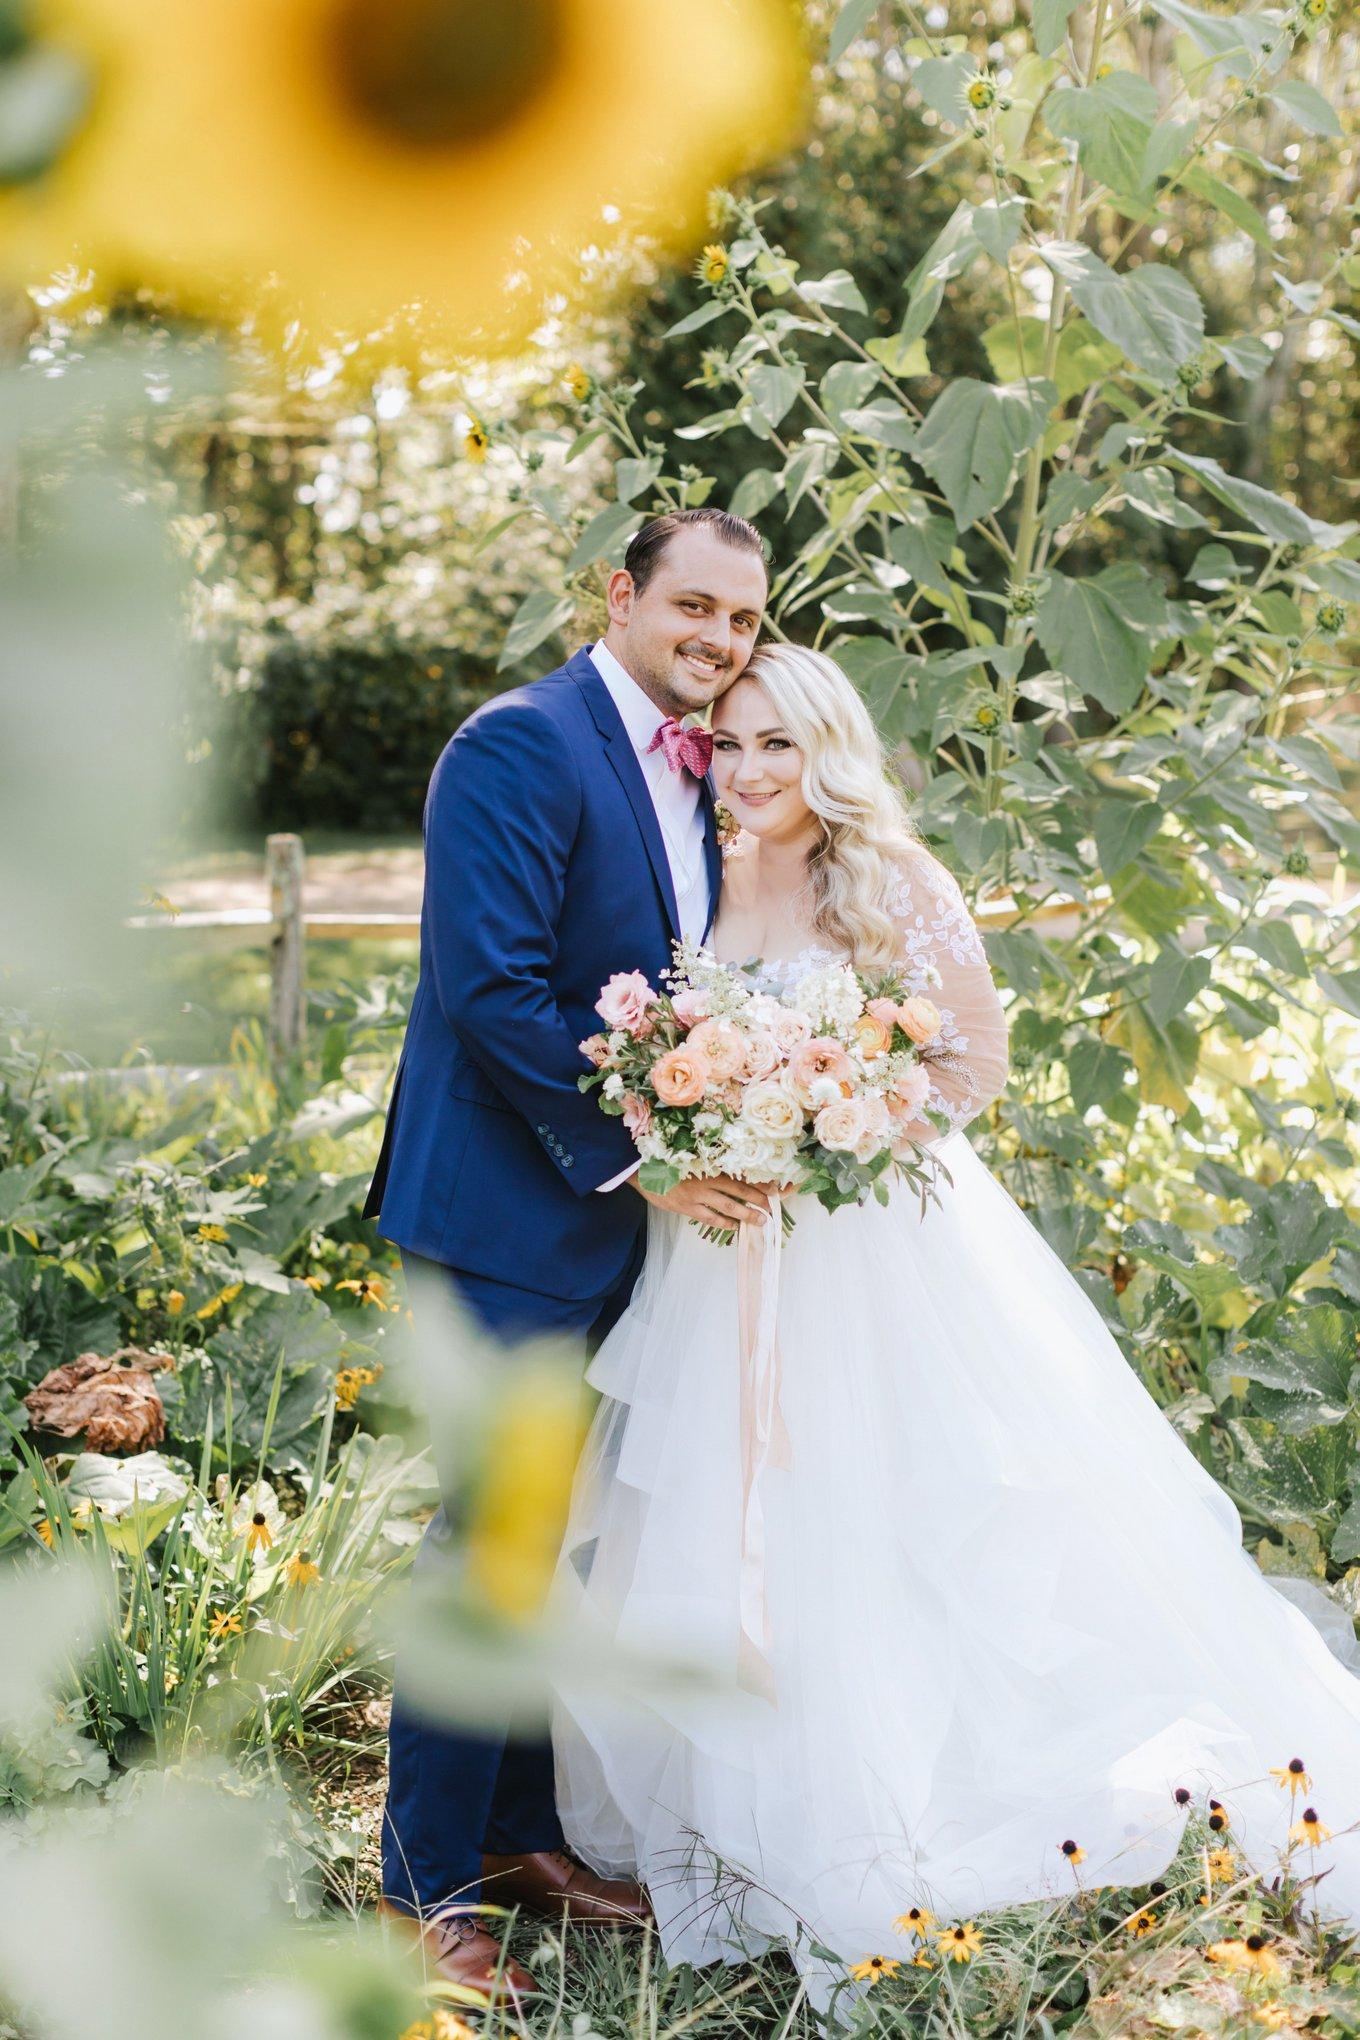 Marthas-Vineyard-Wedding-Photographer-Beach-Plum-Inn-11.jpg